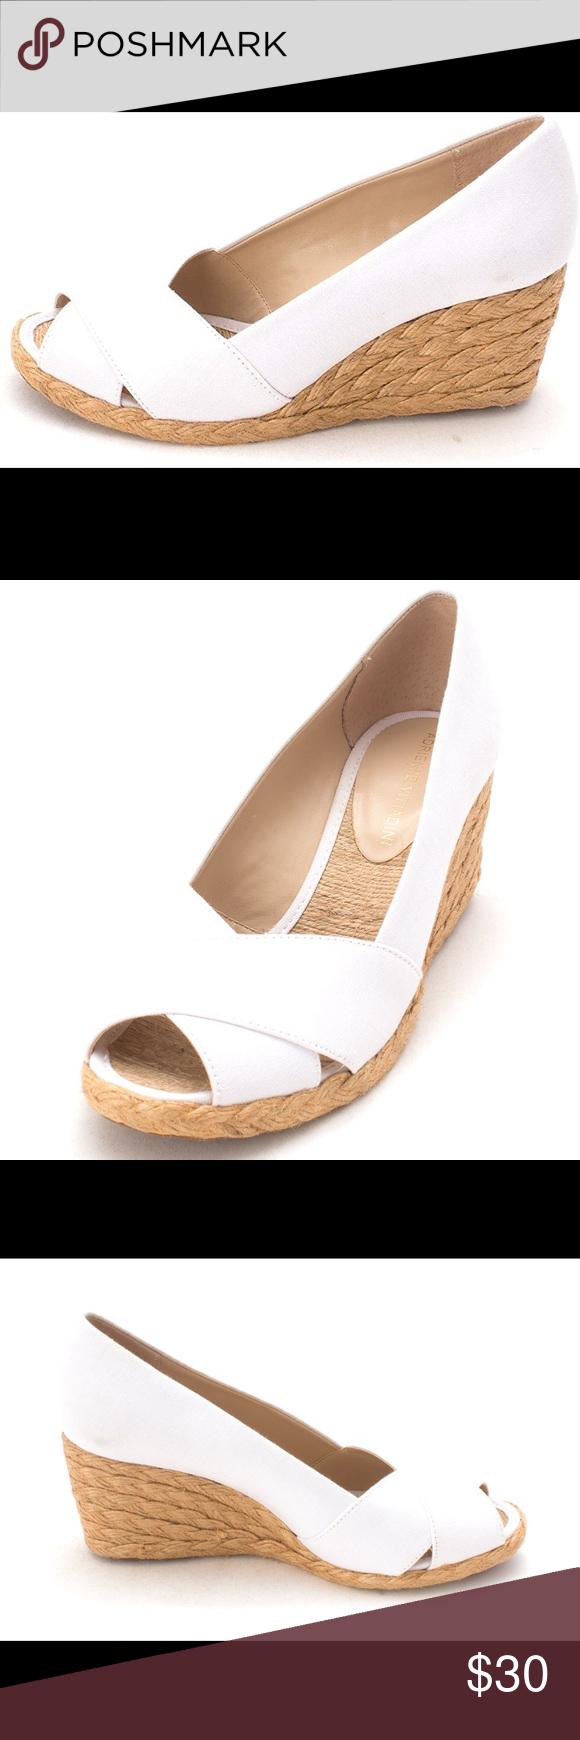 "8894c4f2770d Adrienne Vittadini Bailee Wedge Adrienne Vittadini peep toe Bailee wedge  espadrilles pumps. 3"" height. EUC!!!! Adrienne Vittadini Shoes Wedges"